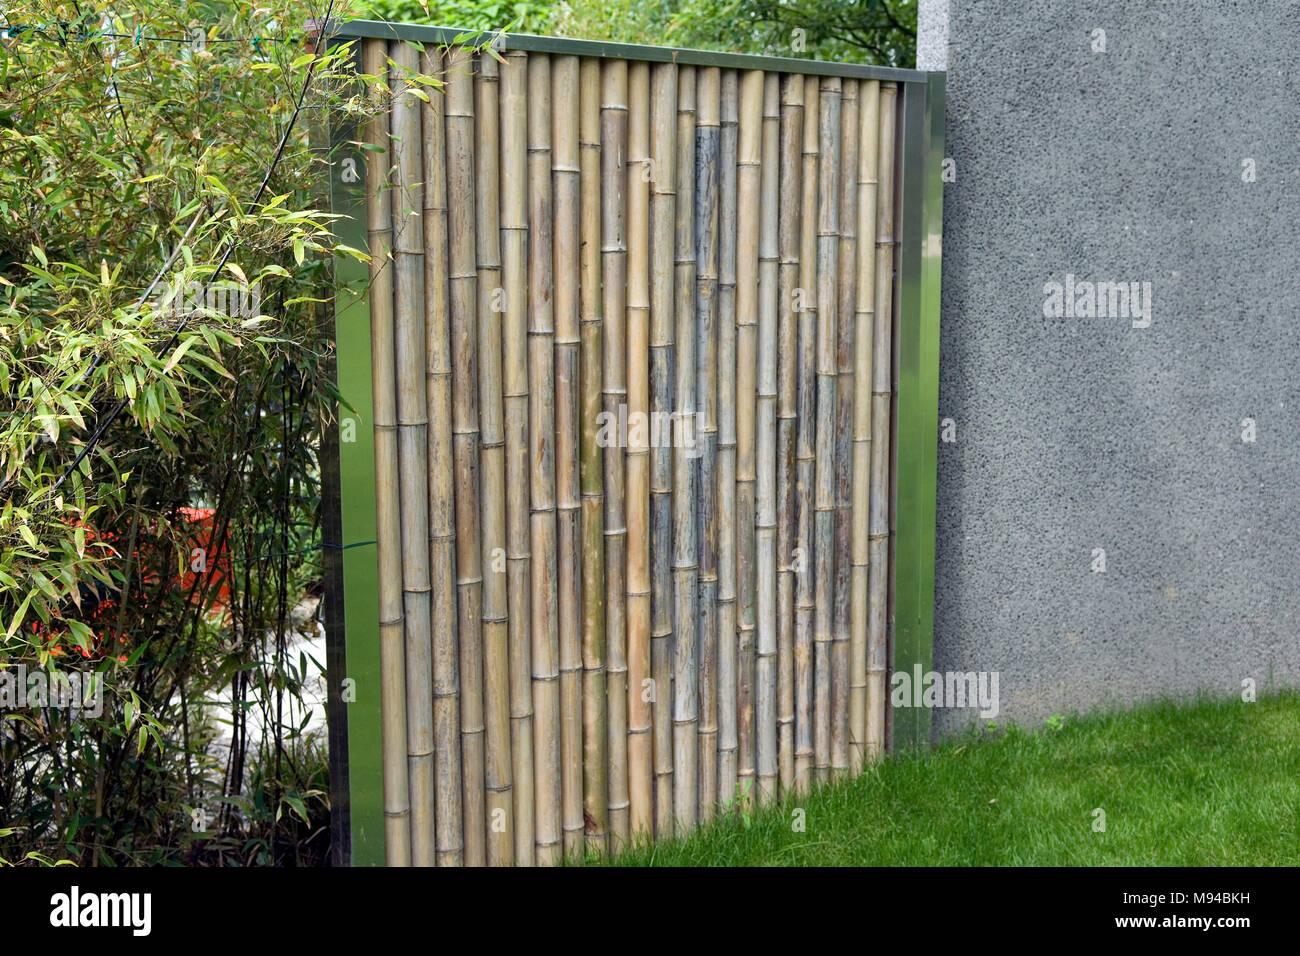 bambus; sichtschutz; bambusschutzwand stockfoto, bild: 177732565 - alamy